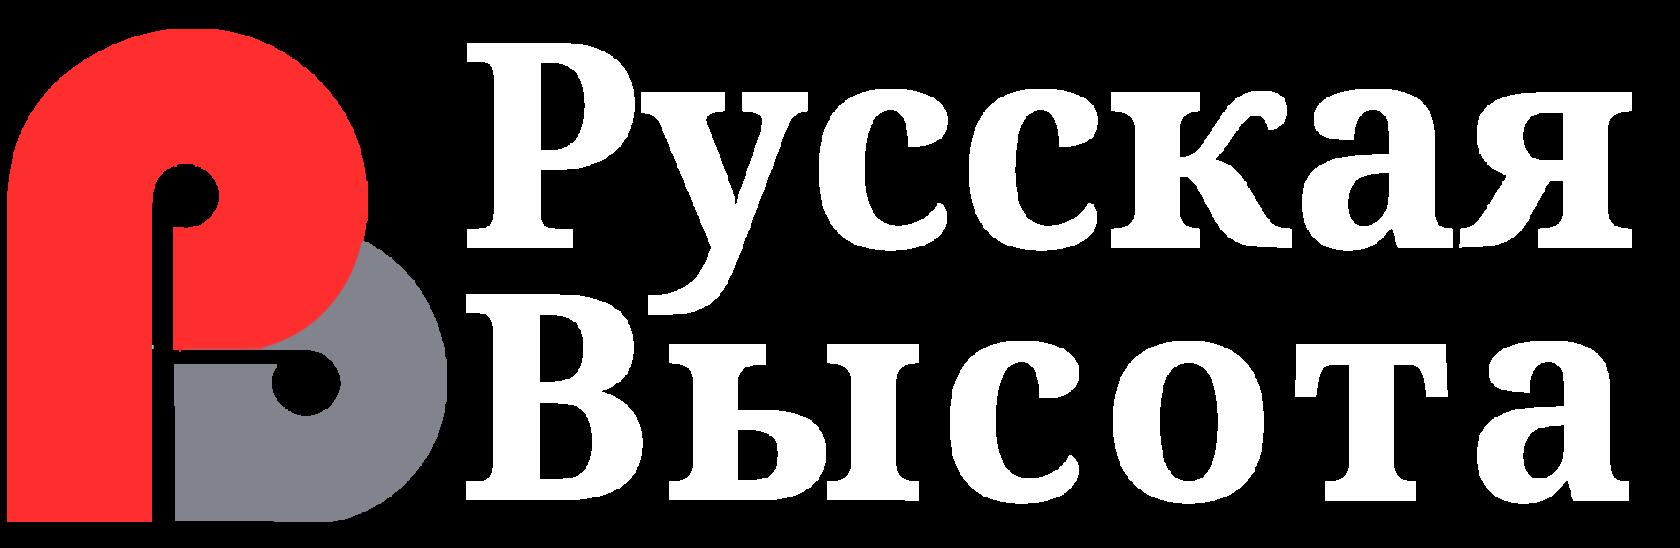 Русская Высота